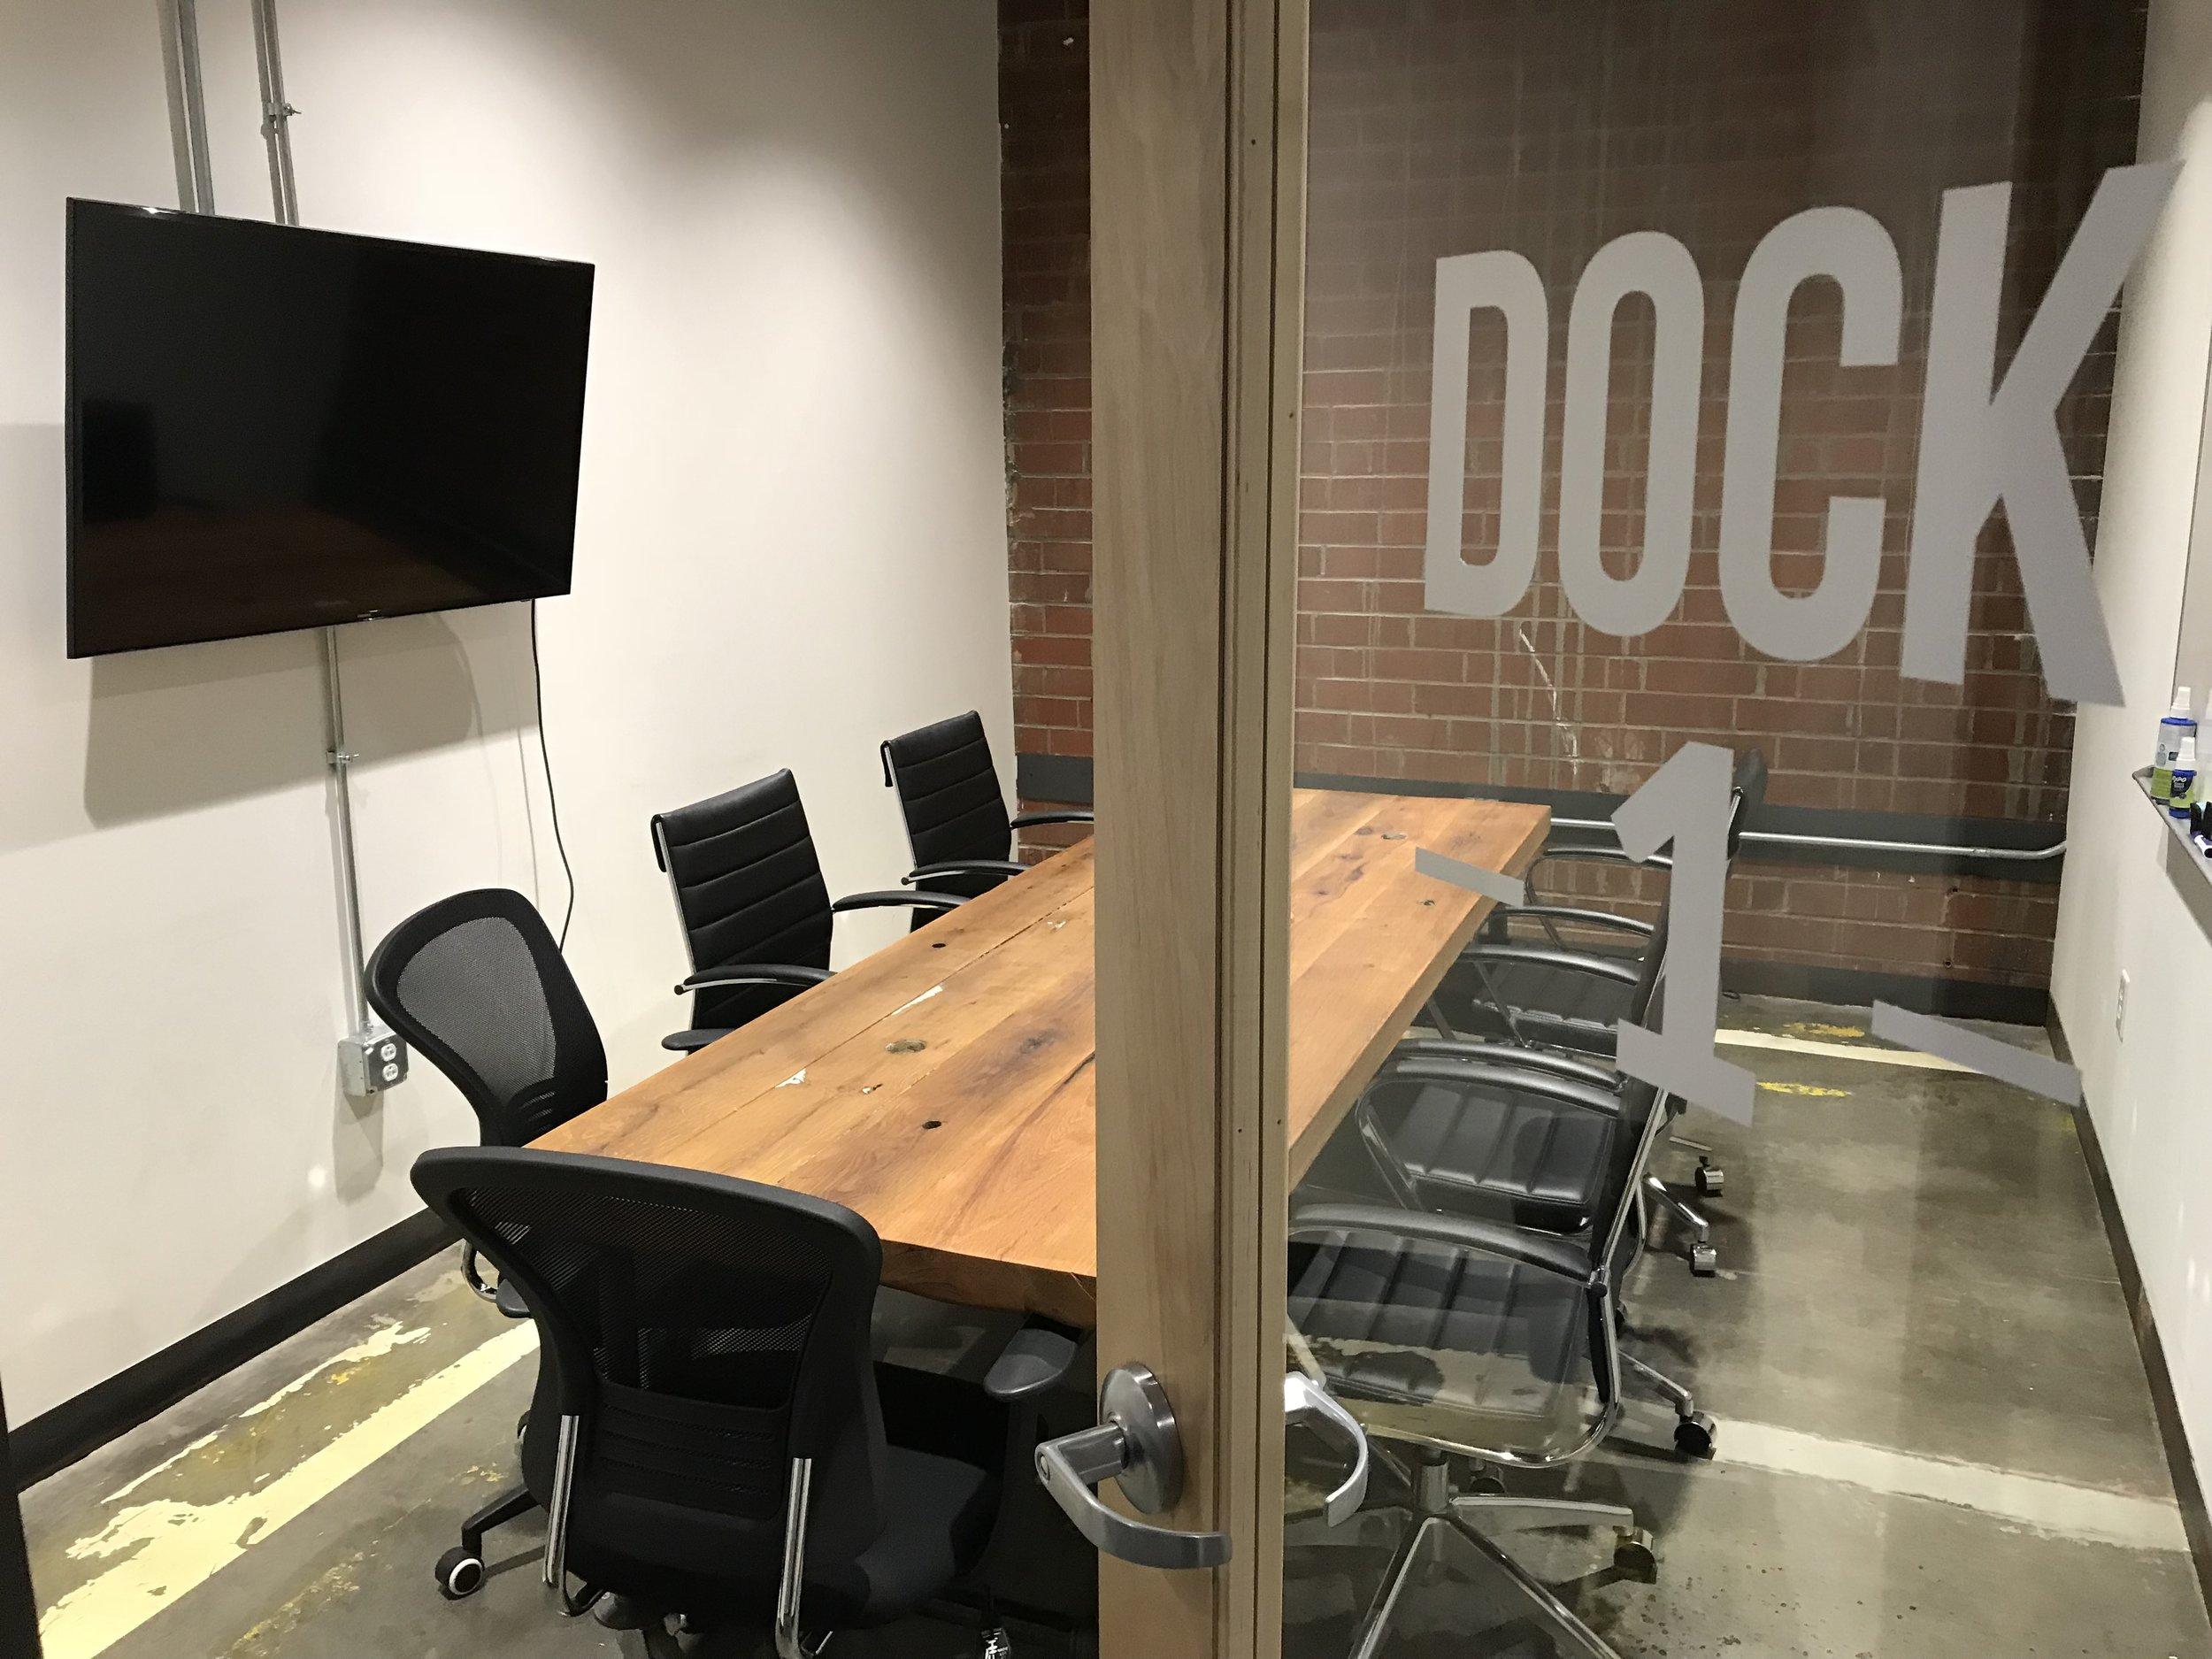 DOCK 1 - Fits 8